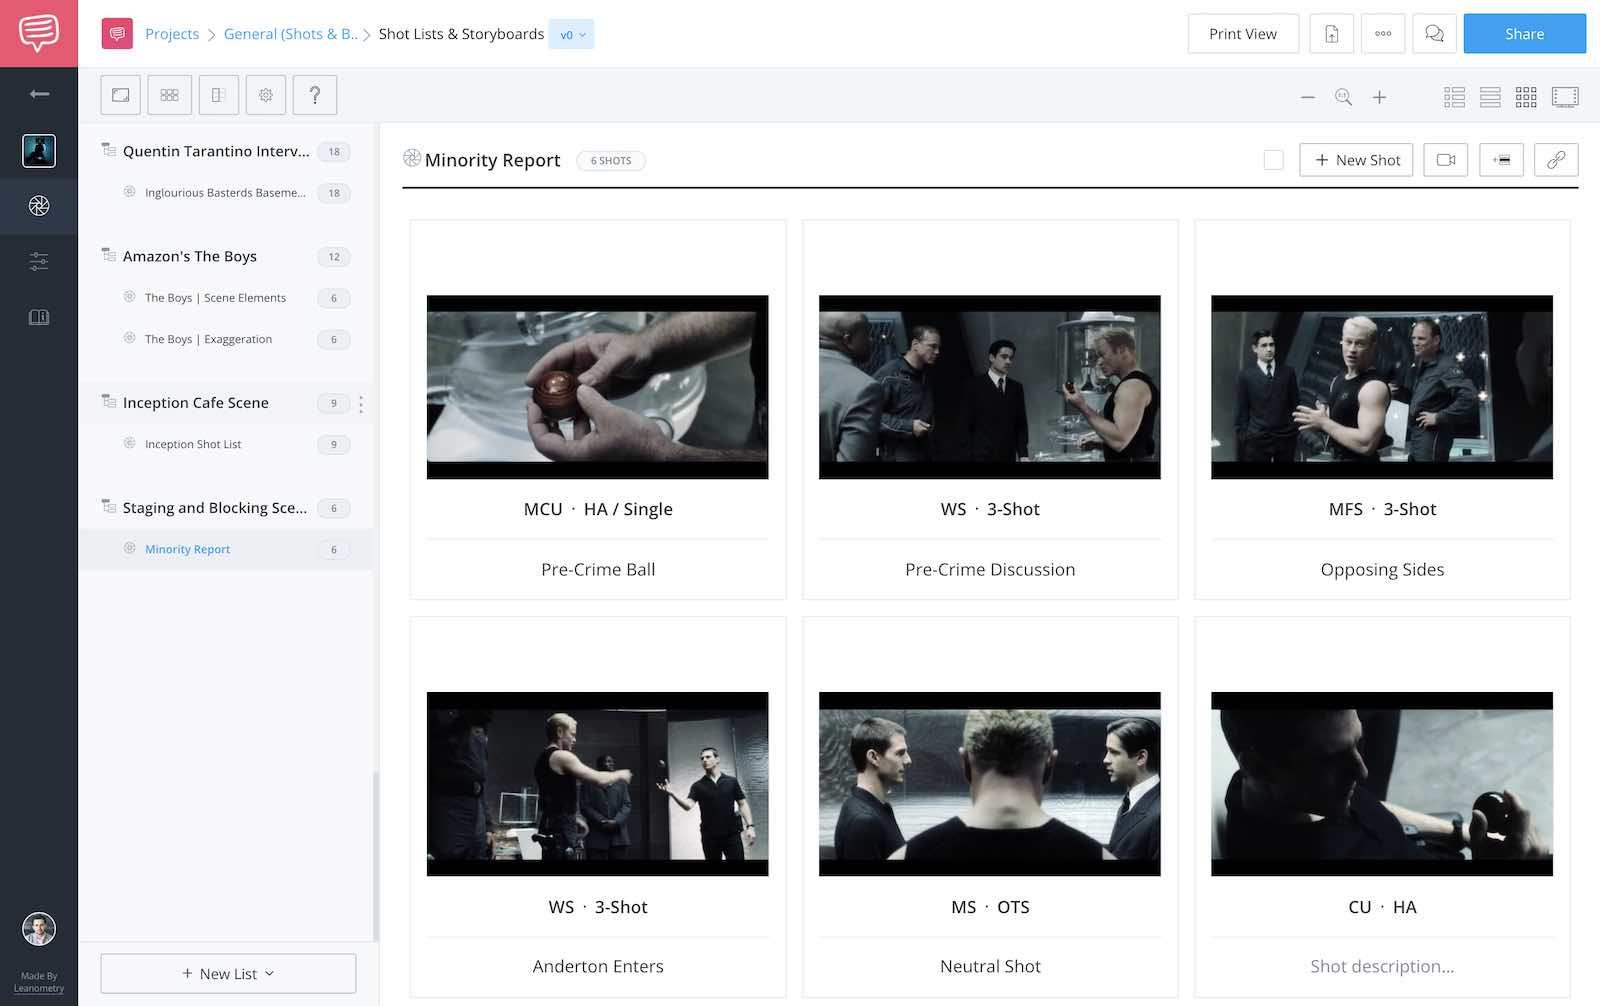 Blocking and Staging Scenes - Minority Report Shot List - StudioBinder